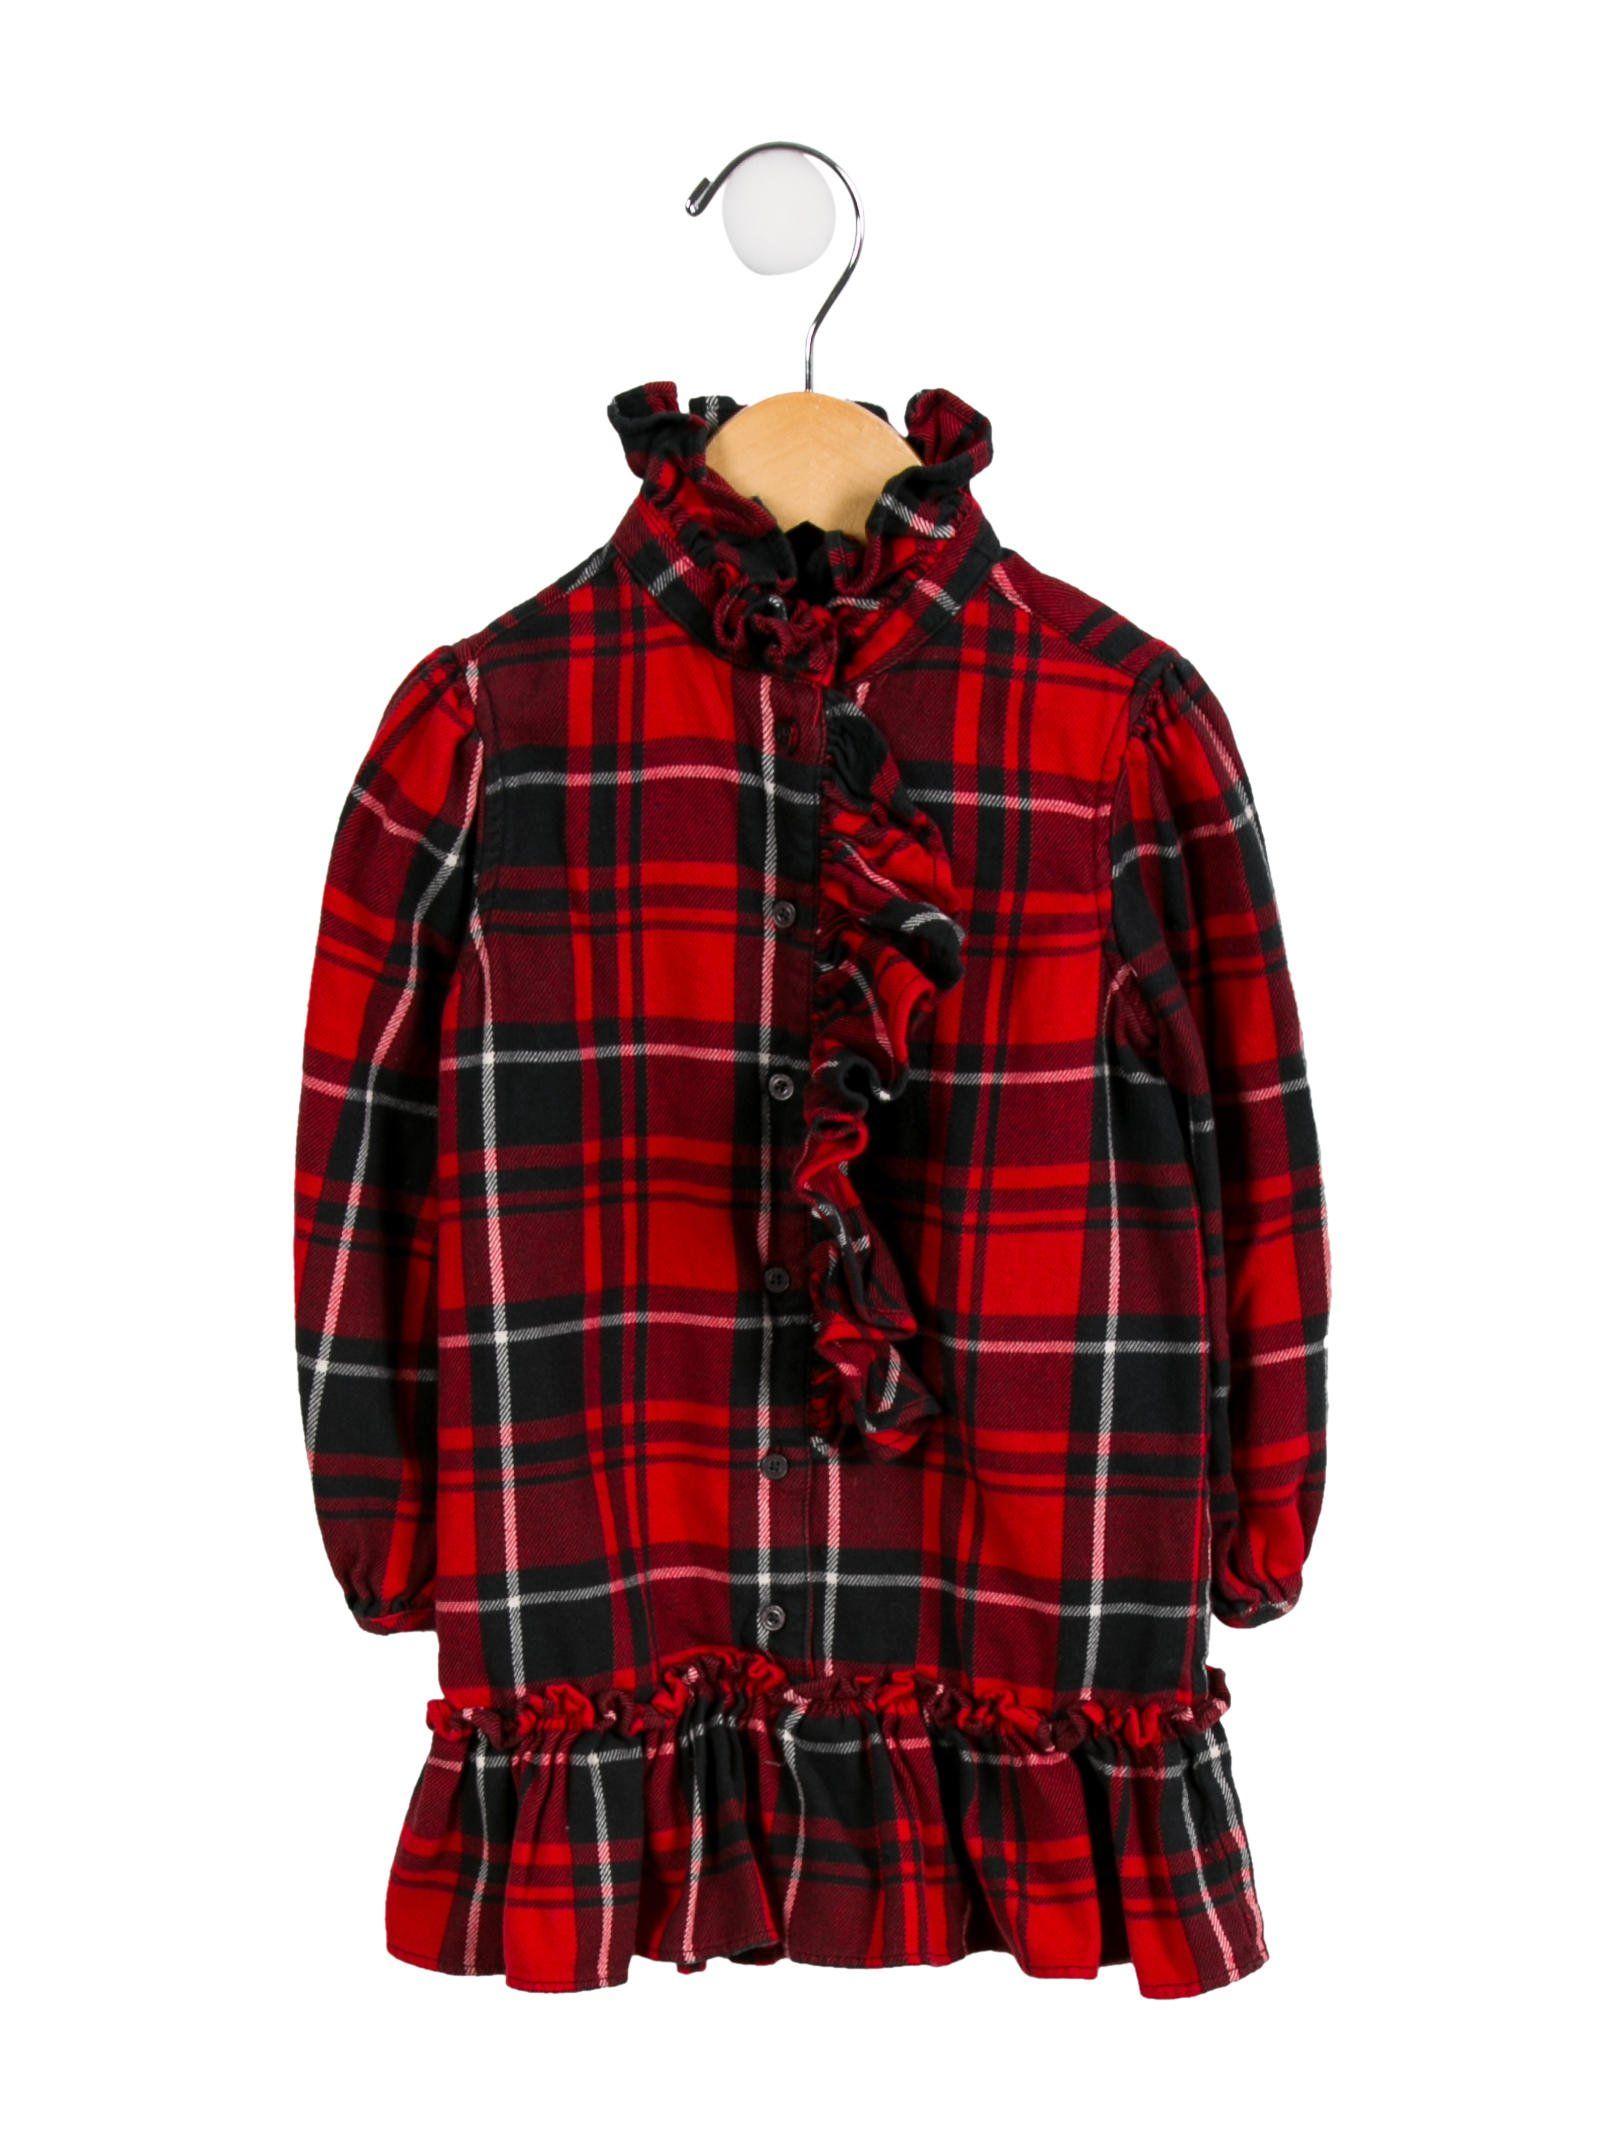 Ralph lauren girlsu plaid ruffleaccented dress fashion